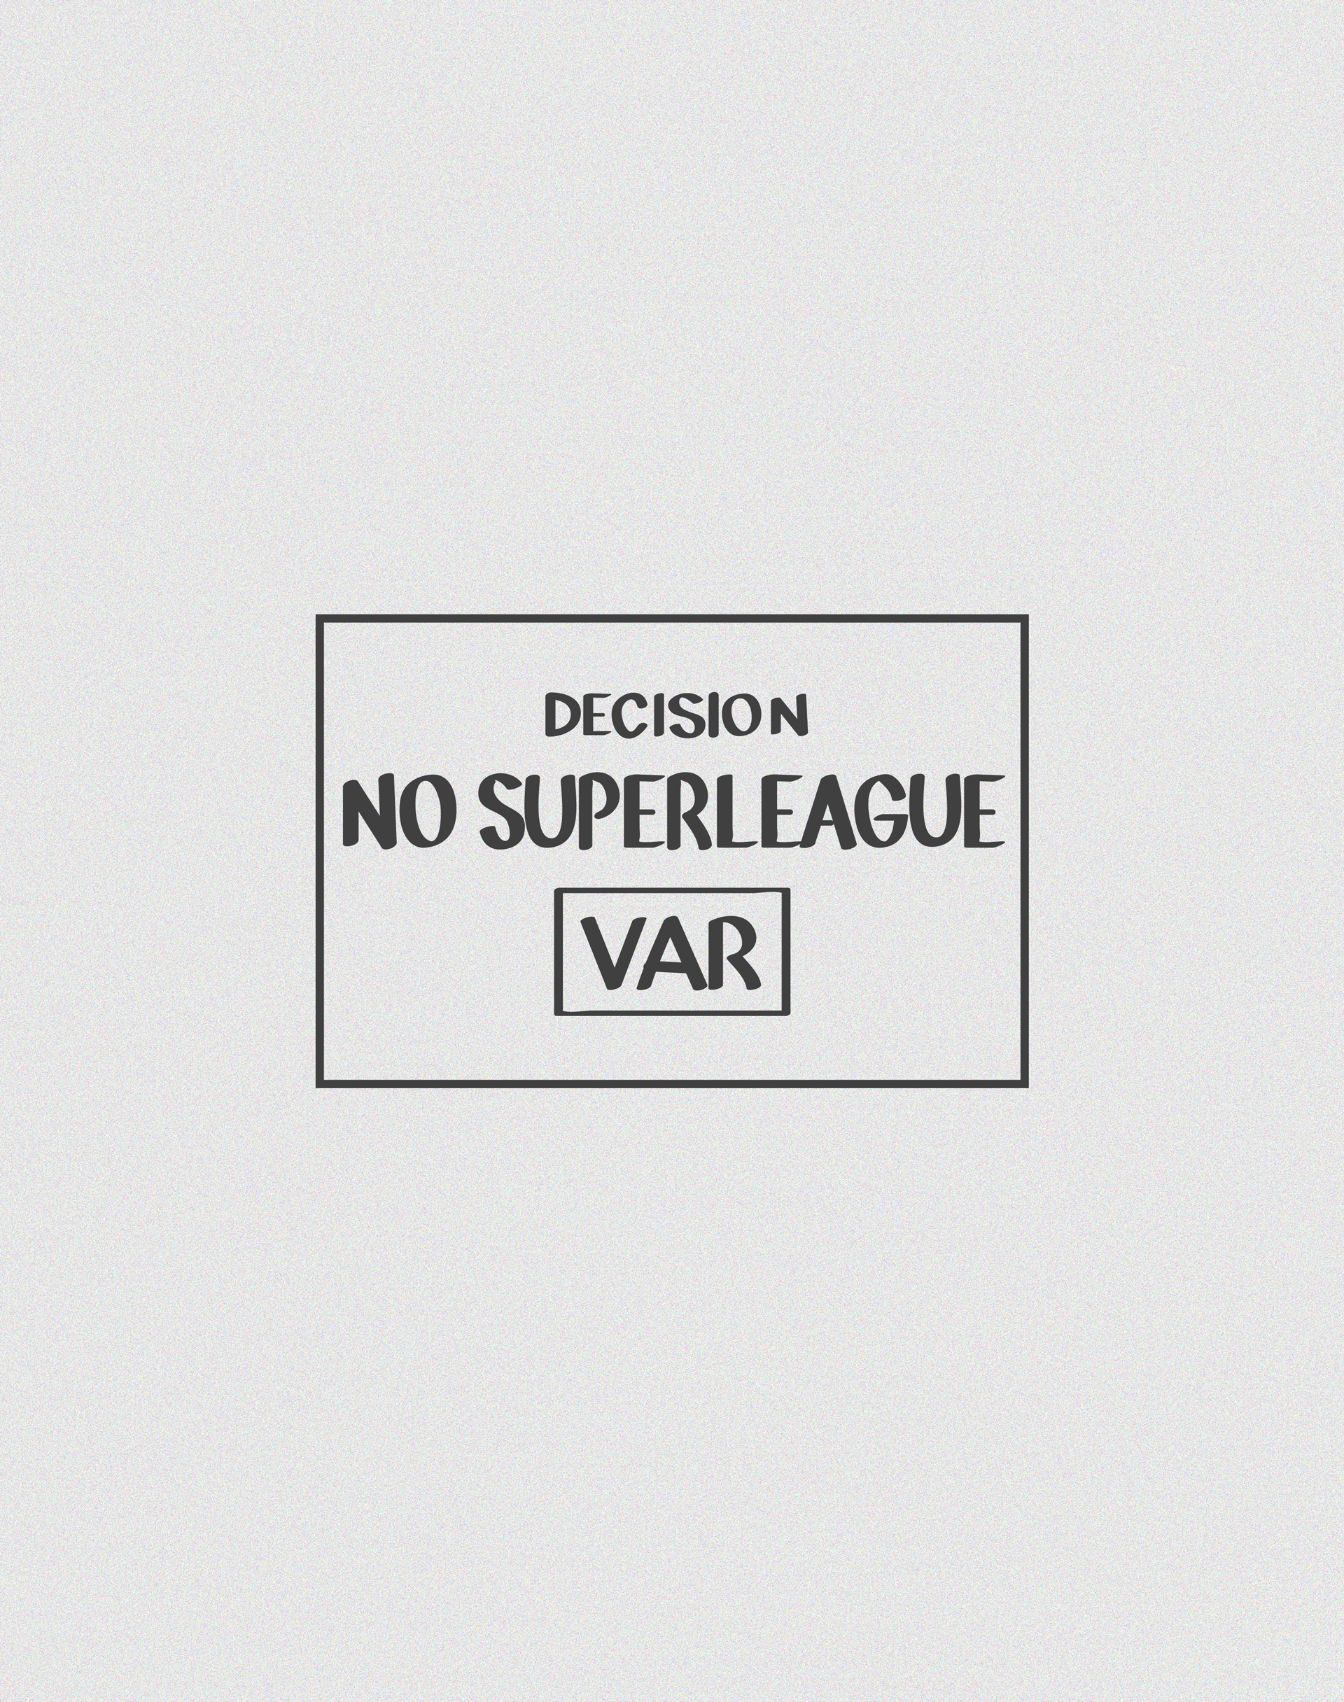 DRAWING-SUPERLEAGUE-VAR-4